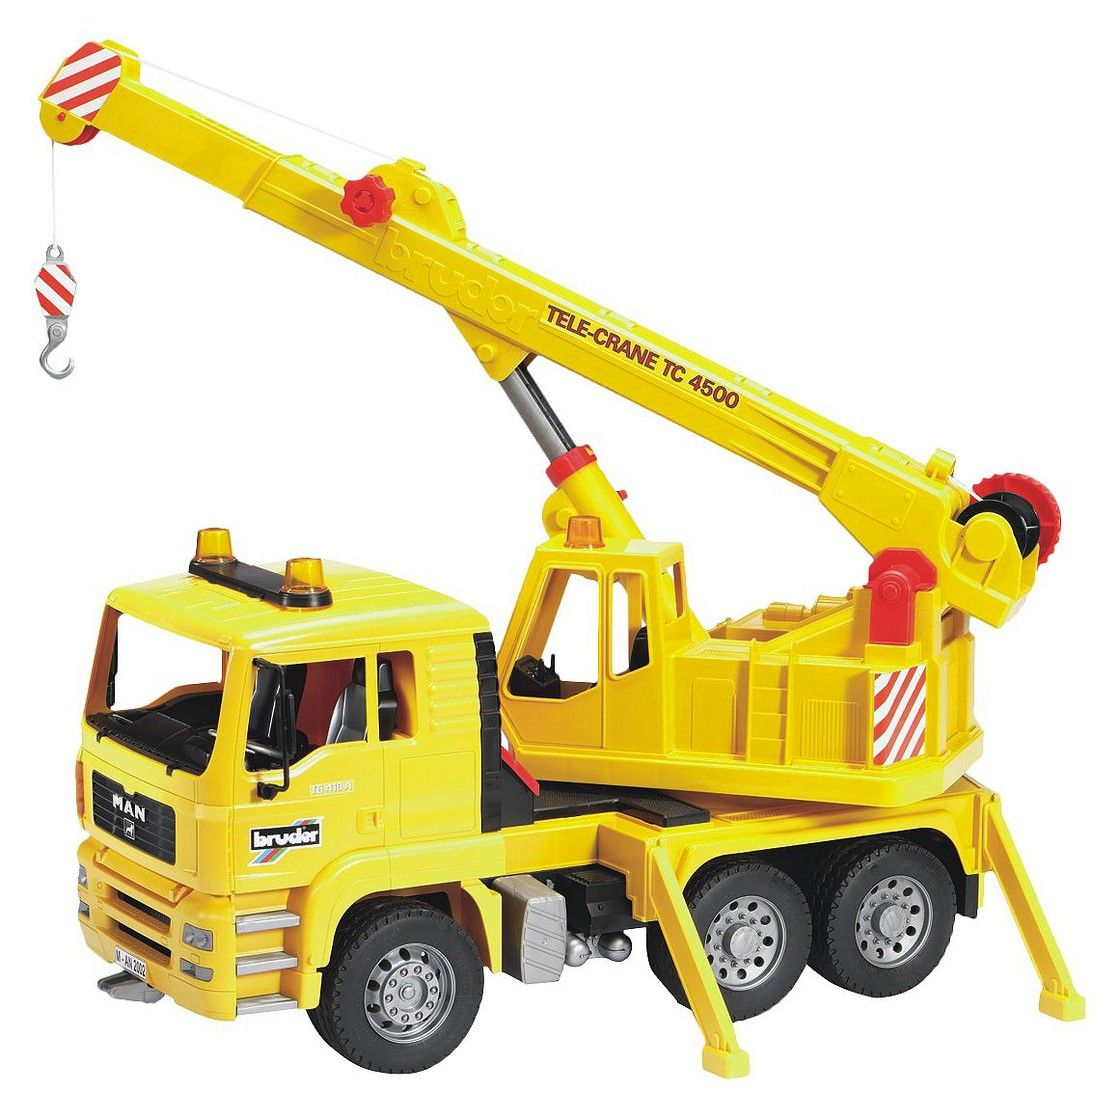 Bruder Toys Man Crane Truck Truck Cranes Toy Trucks Toys For Boys